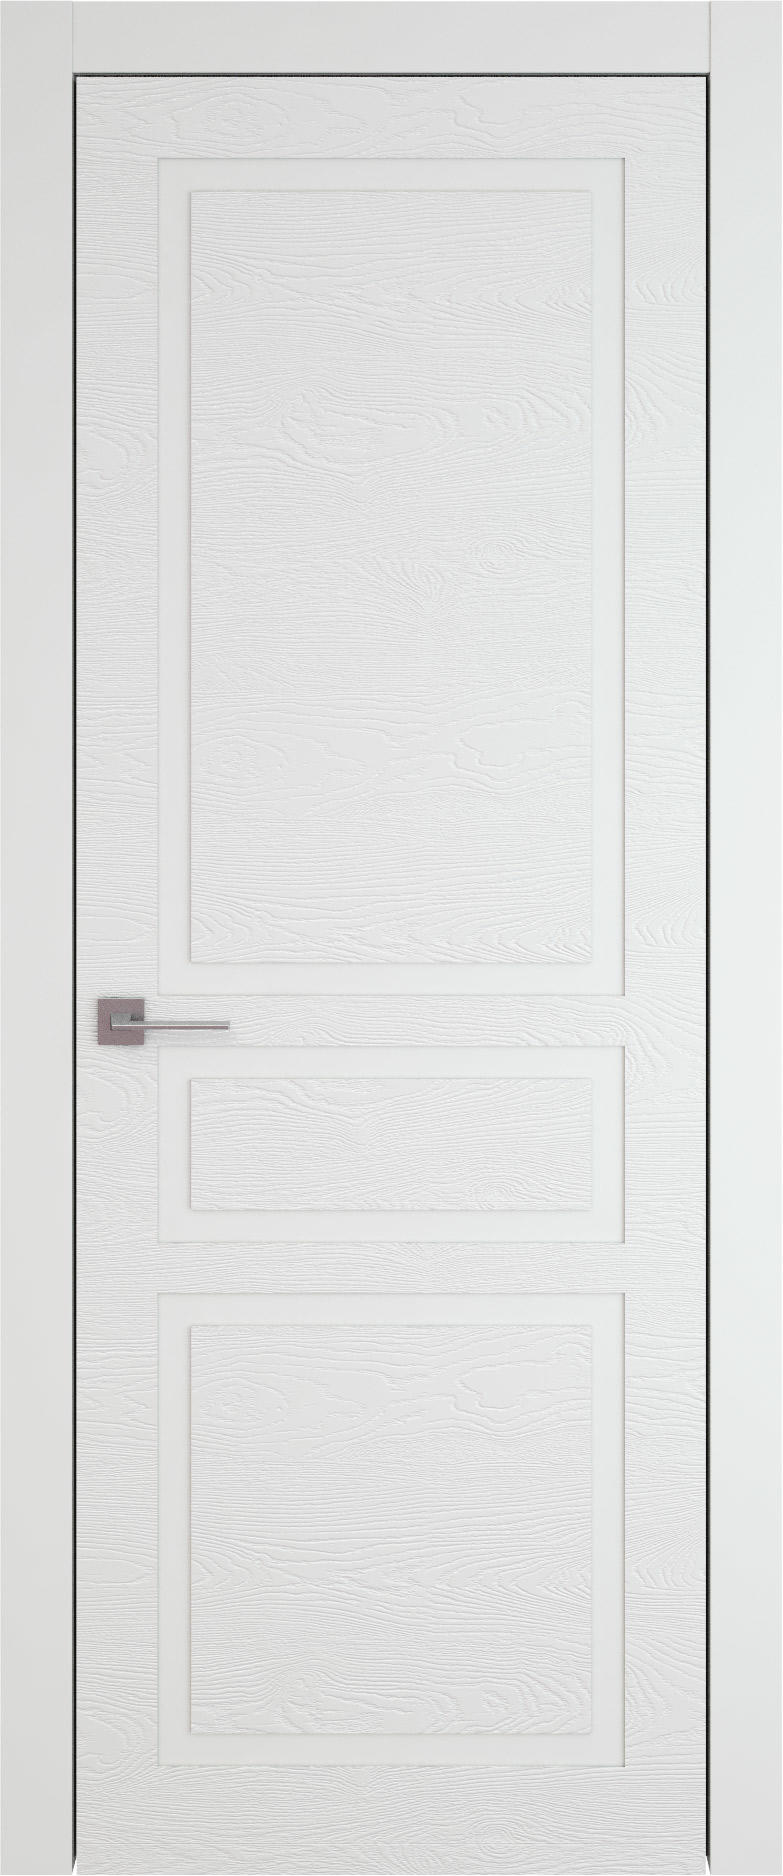 Tivoli Е-5 цвет - Белая эмаль по шпону (RAL 9003) Без стекла (ДГ)